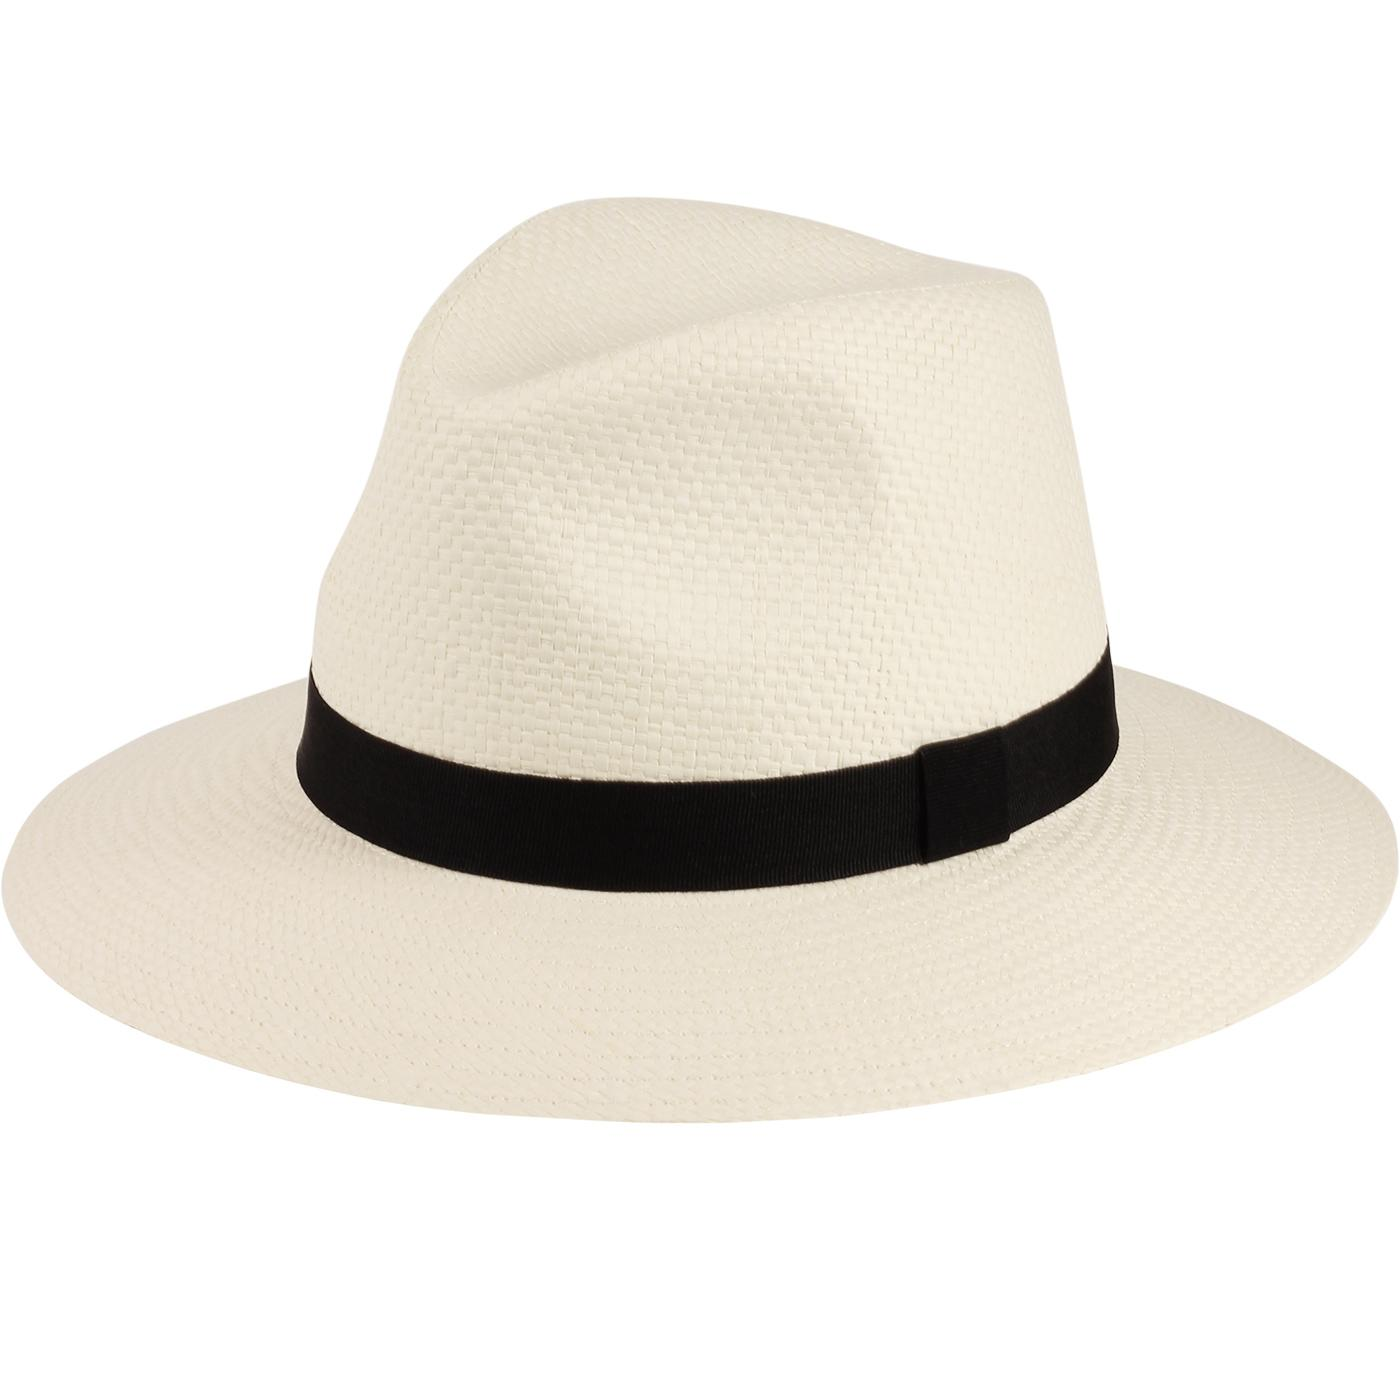 FAILSWORTH Straw Ambassador Fedora Hat (Bleach)